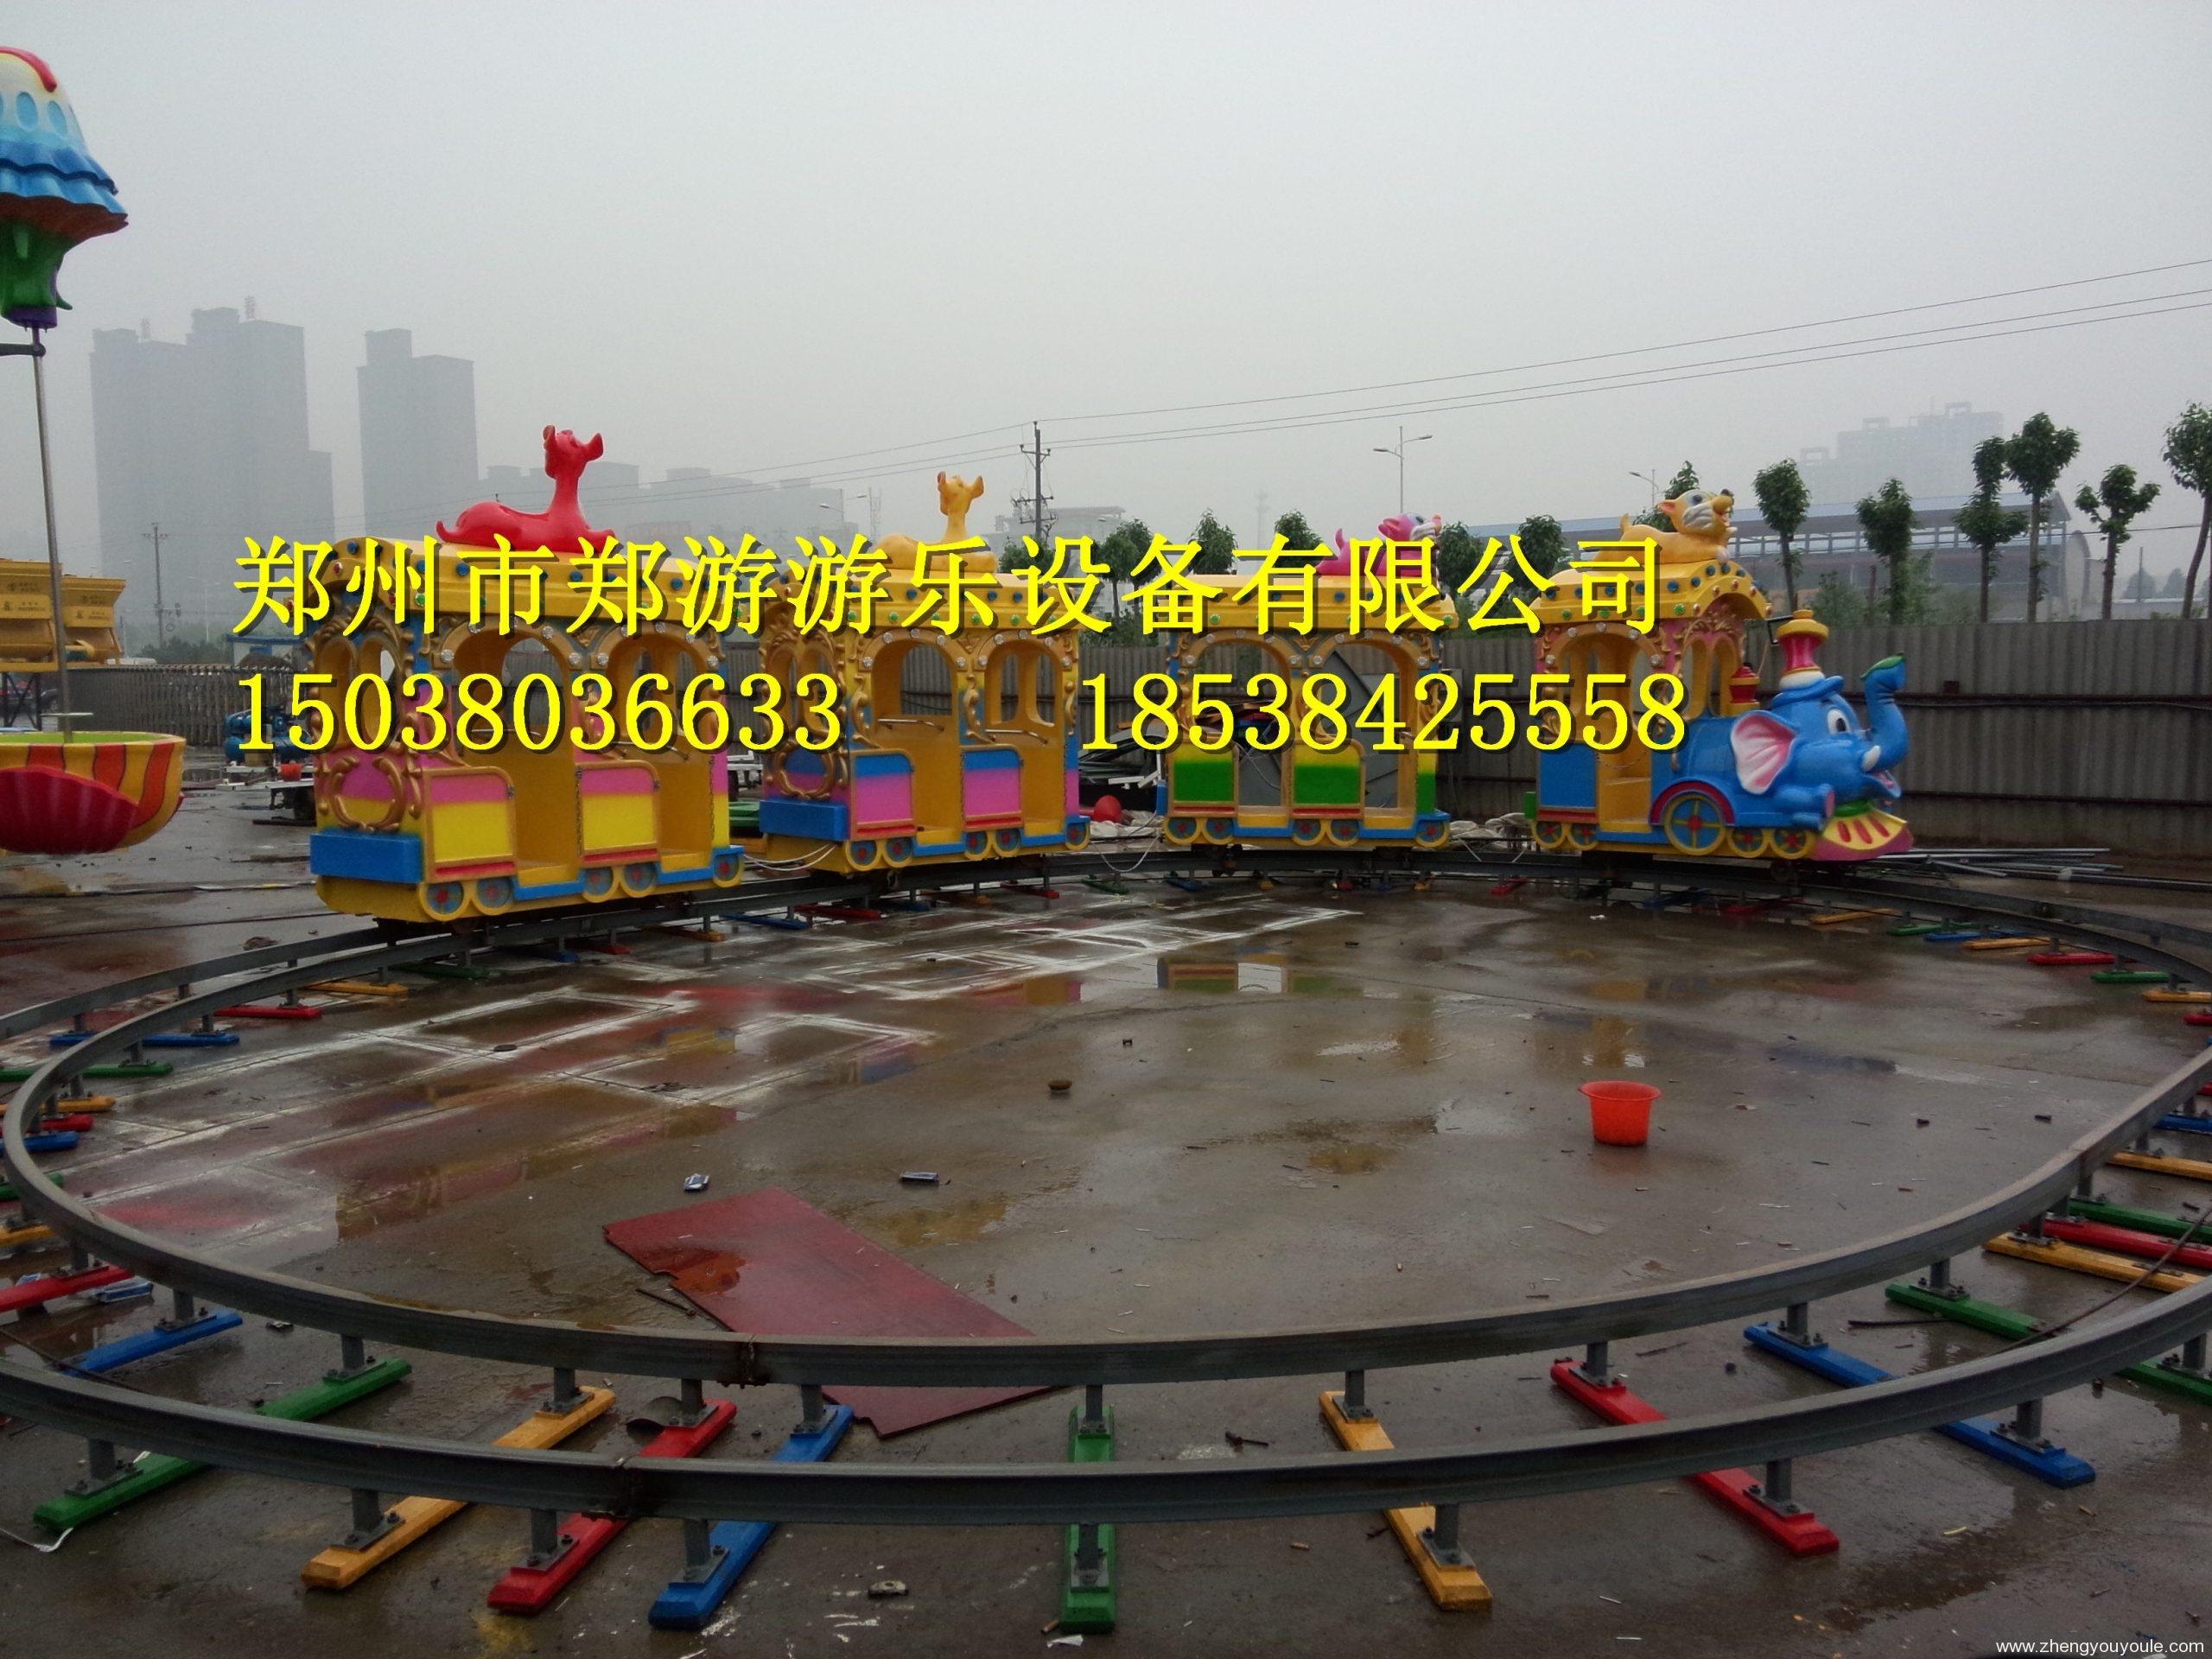 2020030611483279 scaled - 轨道类—轨道火车